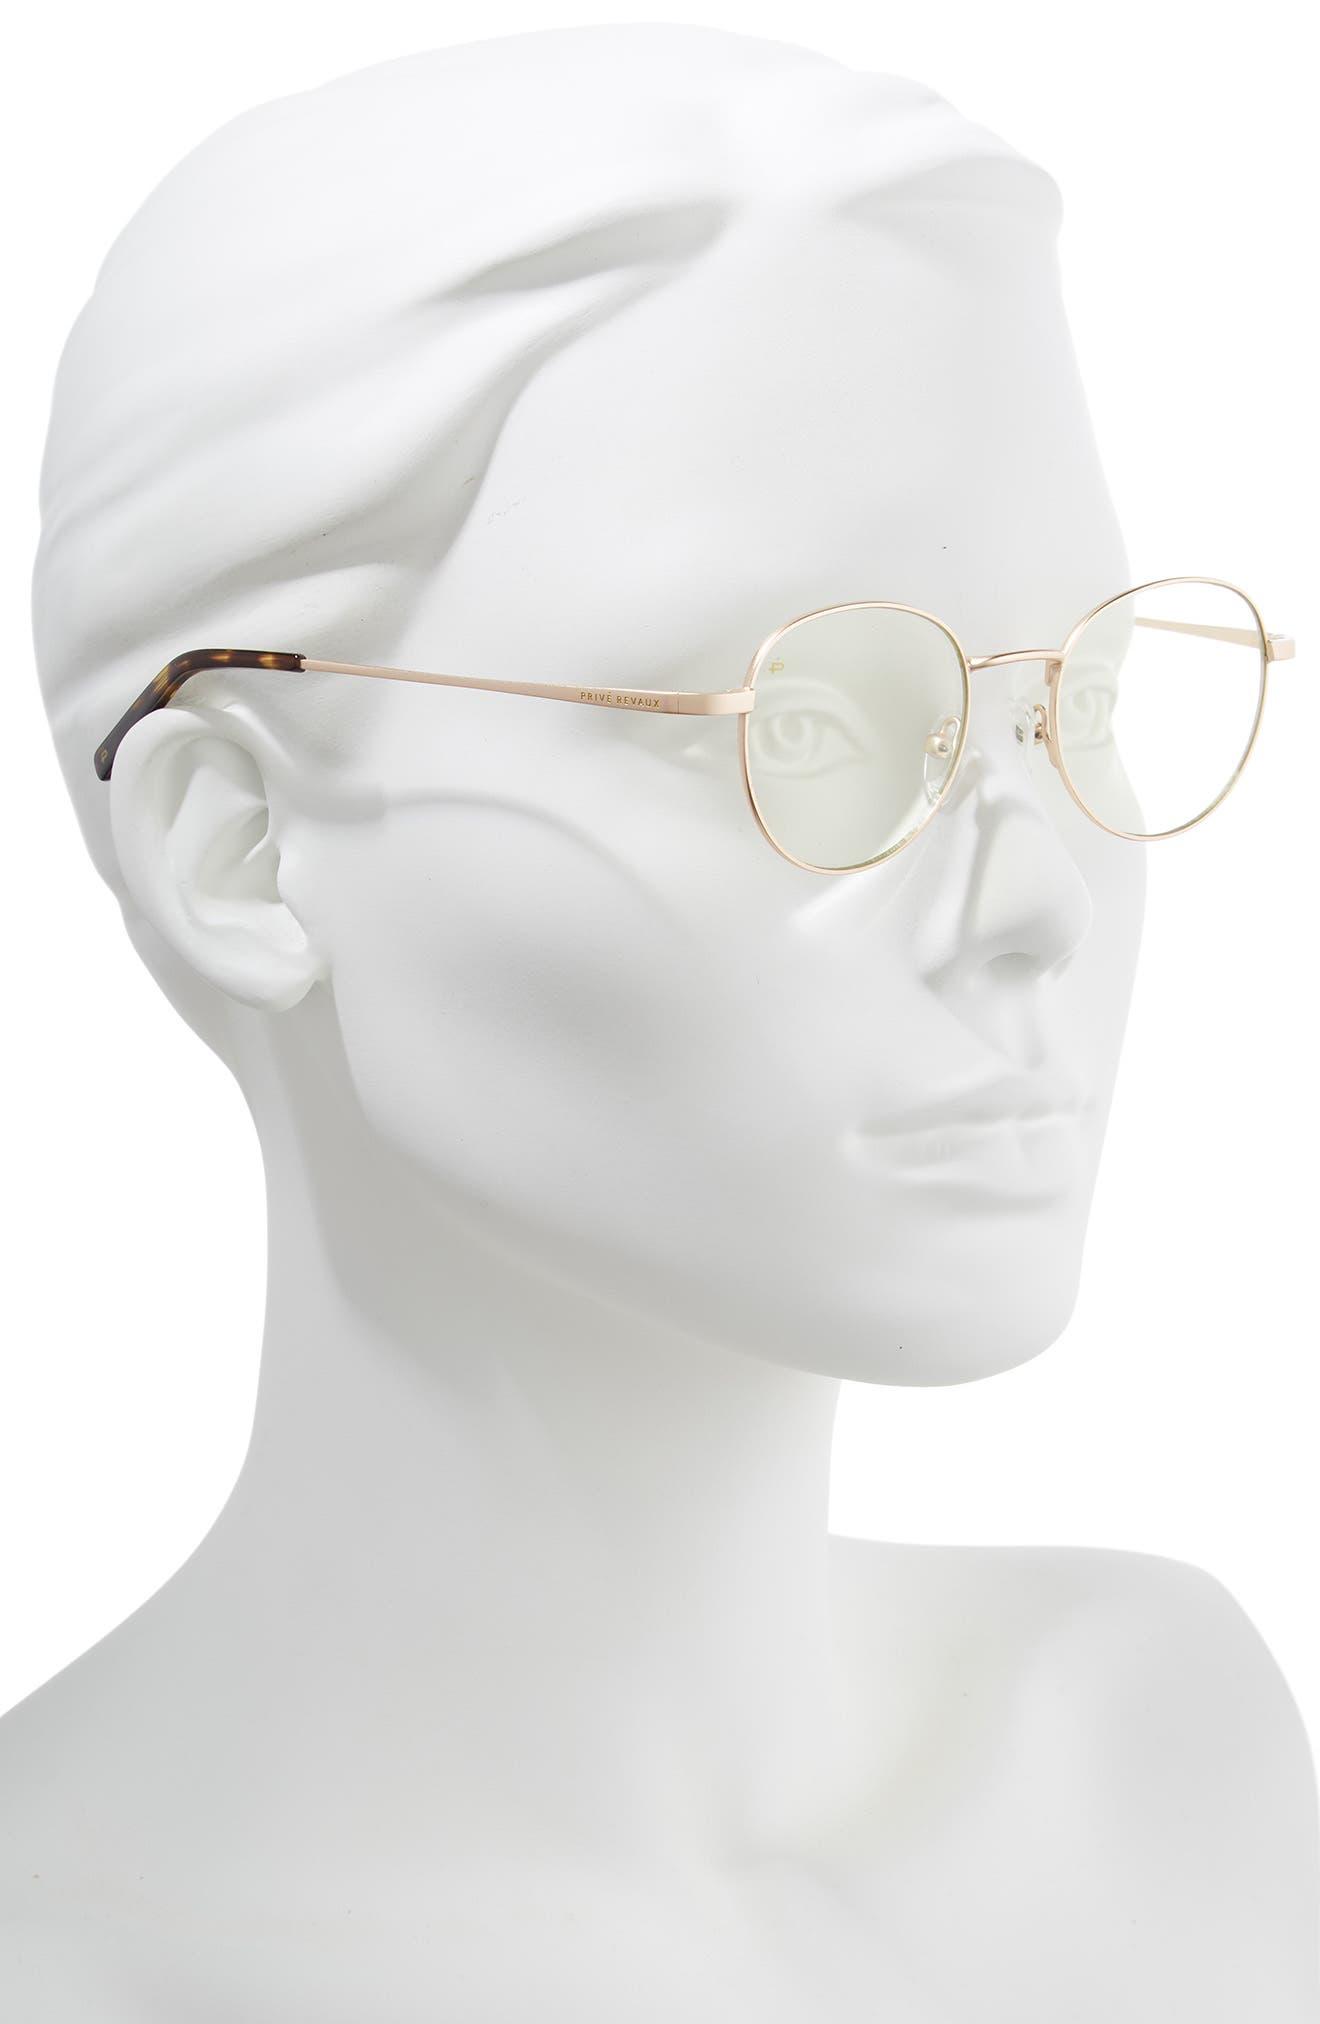 Privé Revaux The Machiavelli 45mm Blue Light Blocking Glasses,                             Alternate thumbnail 4, color,